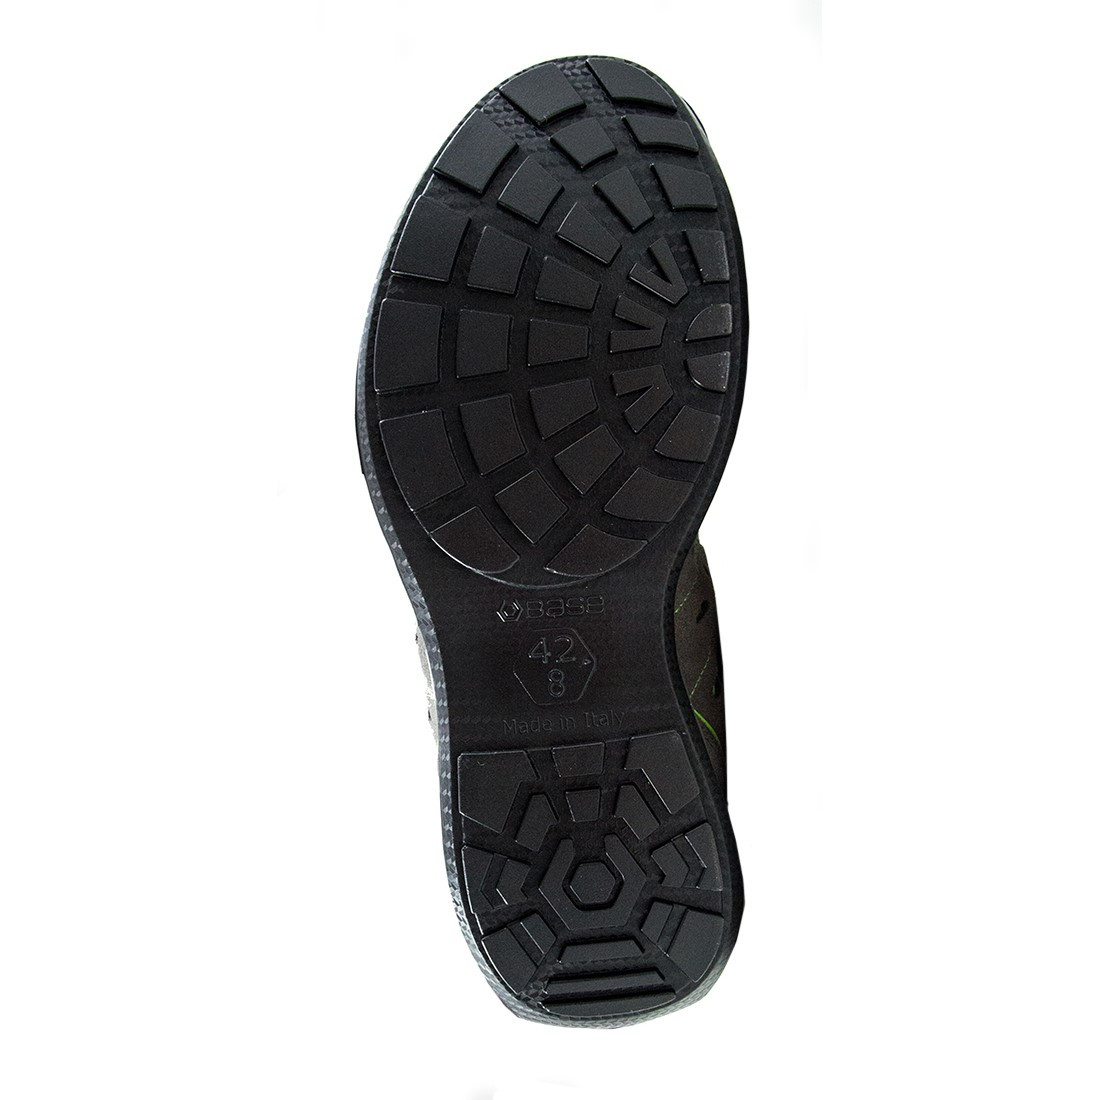 Pantofi Smash S1P SRC - Incaltaminte de protectie